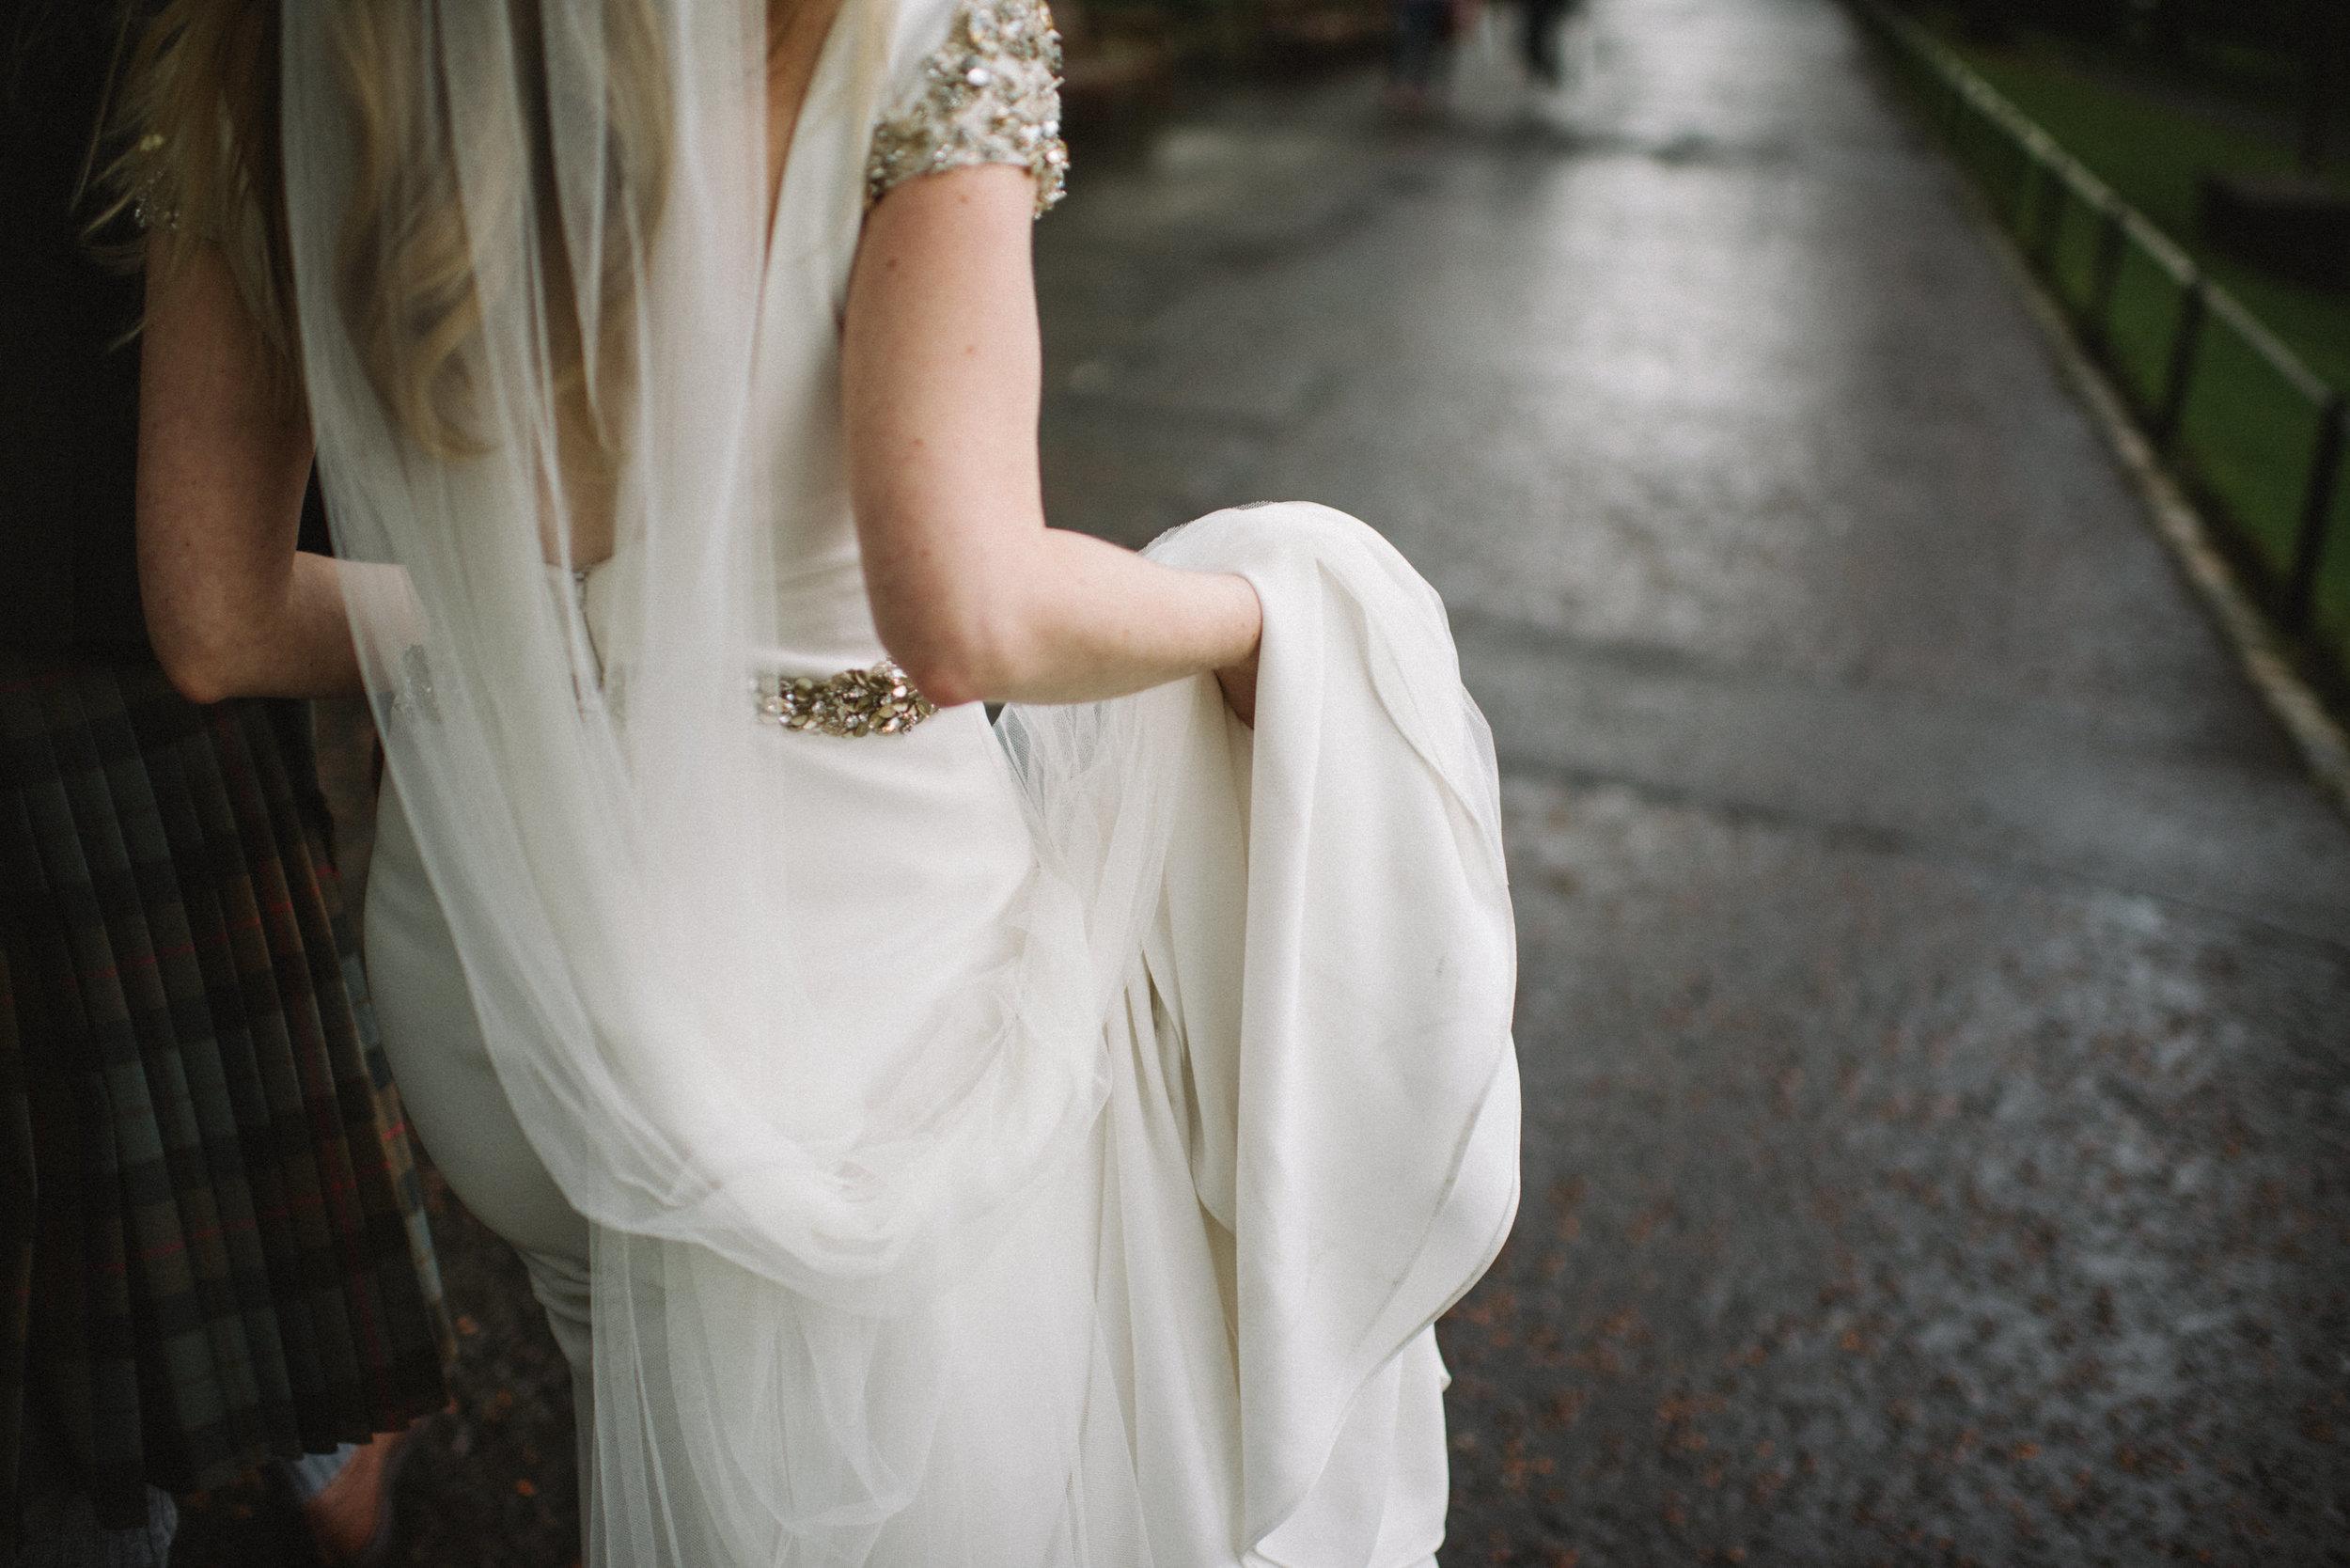 0039-LISA-DEVINE-PHOTOGRAPHY-ALTERNATIVE-WEDDING-PHOTOGRAPHY-SCOTLAND-DESTINATION-WEDDINGS-GLASGOW-WEDDINGS-COOL-WEDDINGS-STYLISH-WEDDINGS.JPG